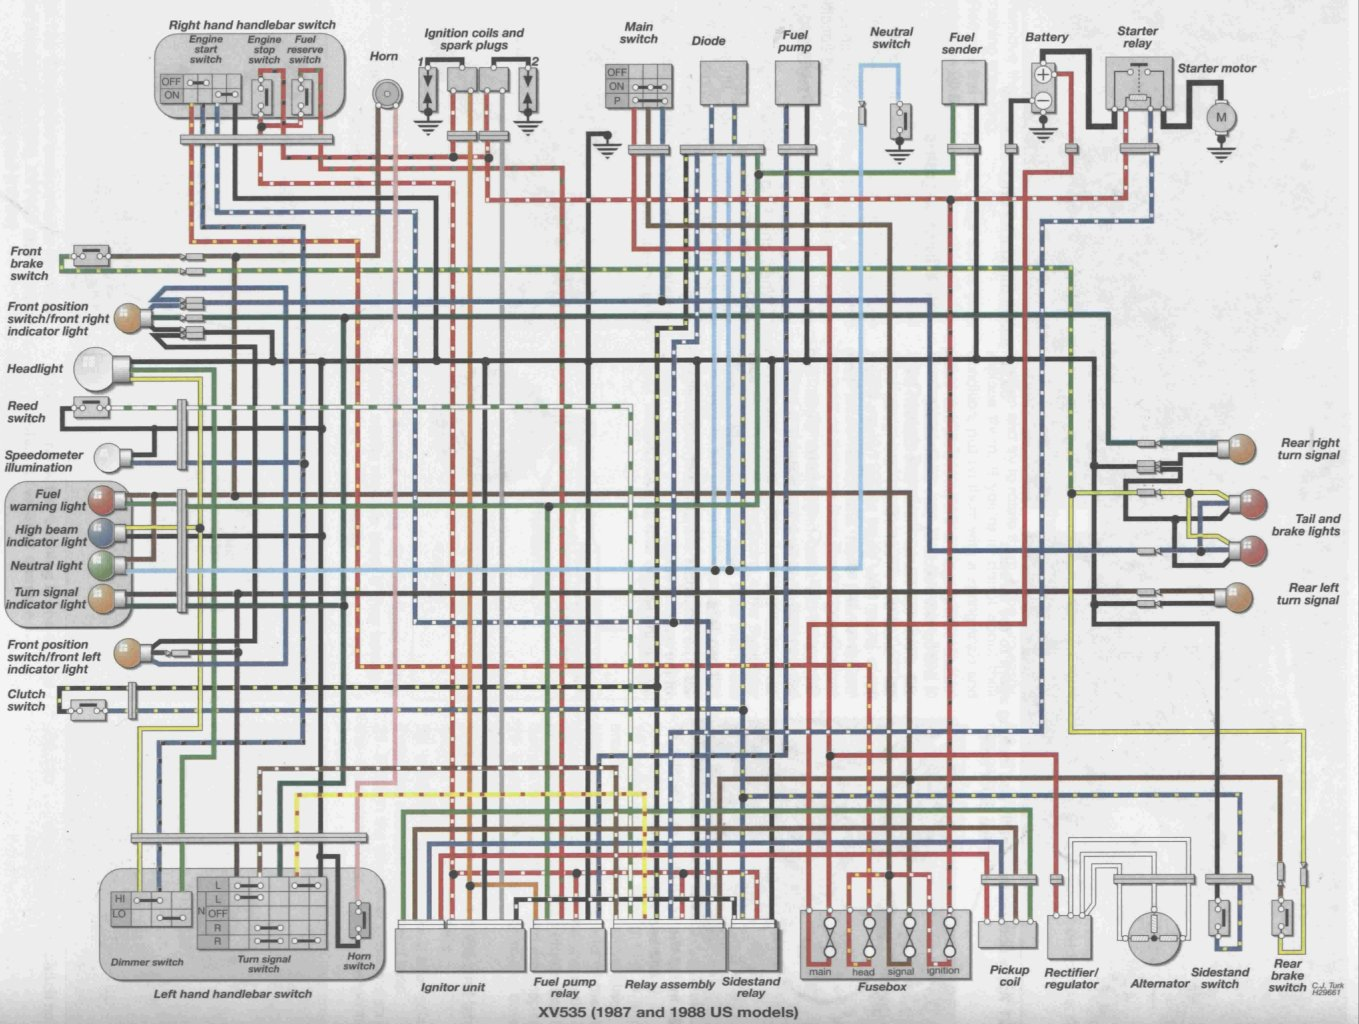 medium resolution of 1984 honda vt500c wiring diagram color wiring diagrams data base rh alfrescosolutions co 1984 honda shadow